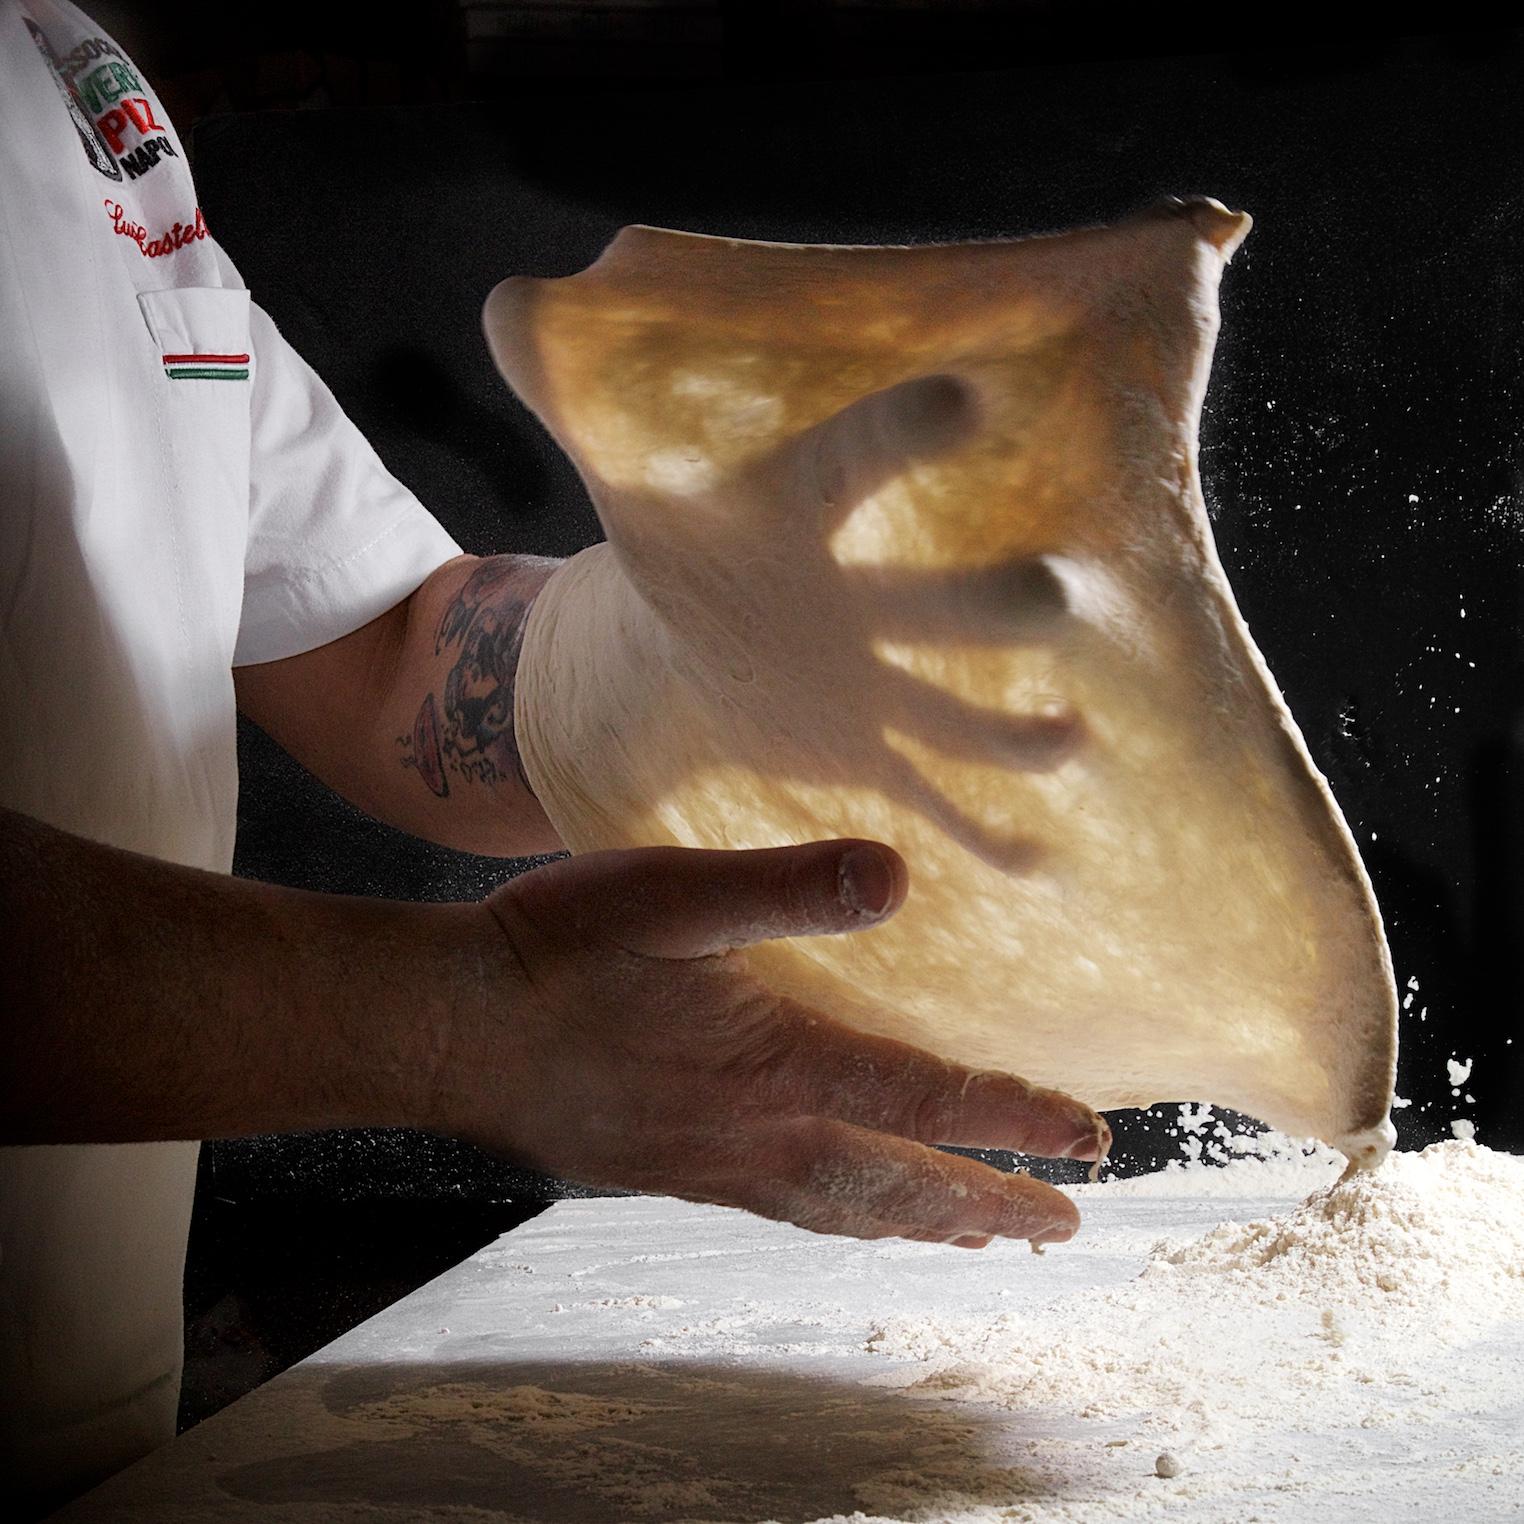 090-Pizzazzà-Nologo_IMG_9679